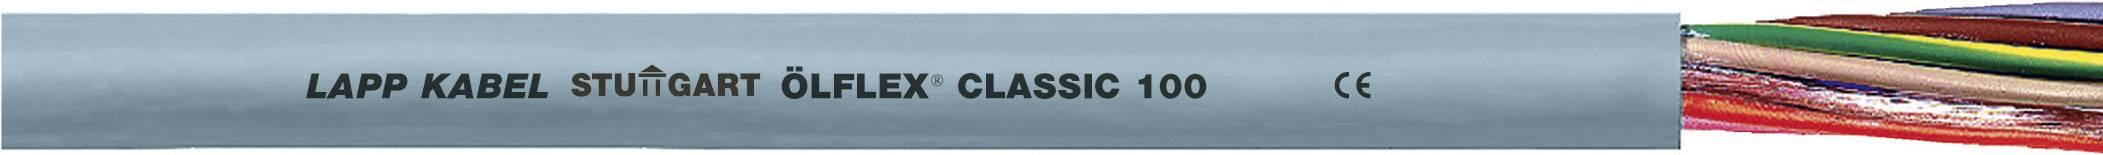 Kabel LappKabel Ölflex CLASSIC 100 50G0,75 (0010037), PVC, 19,2 mm, 500 V, šedá, 100 m